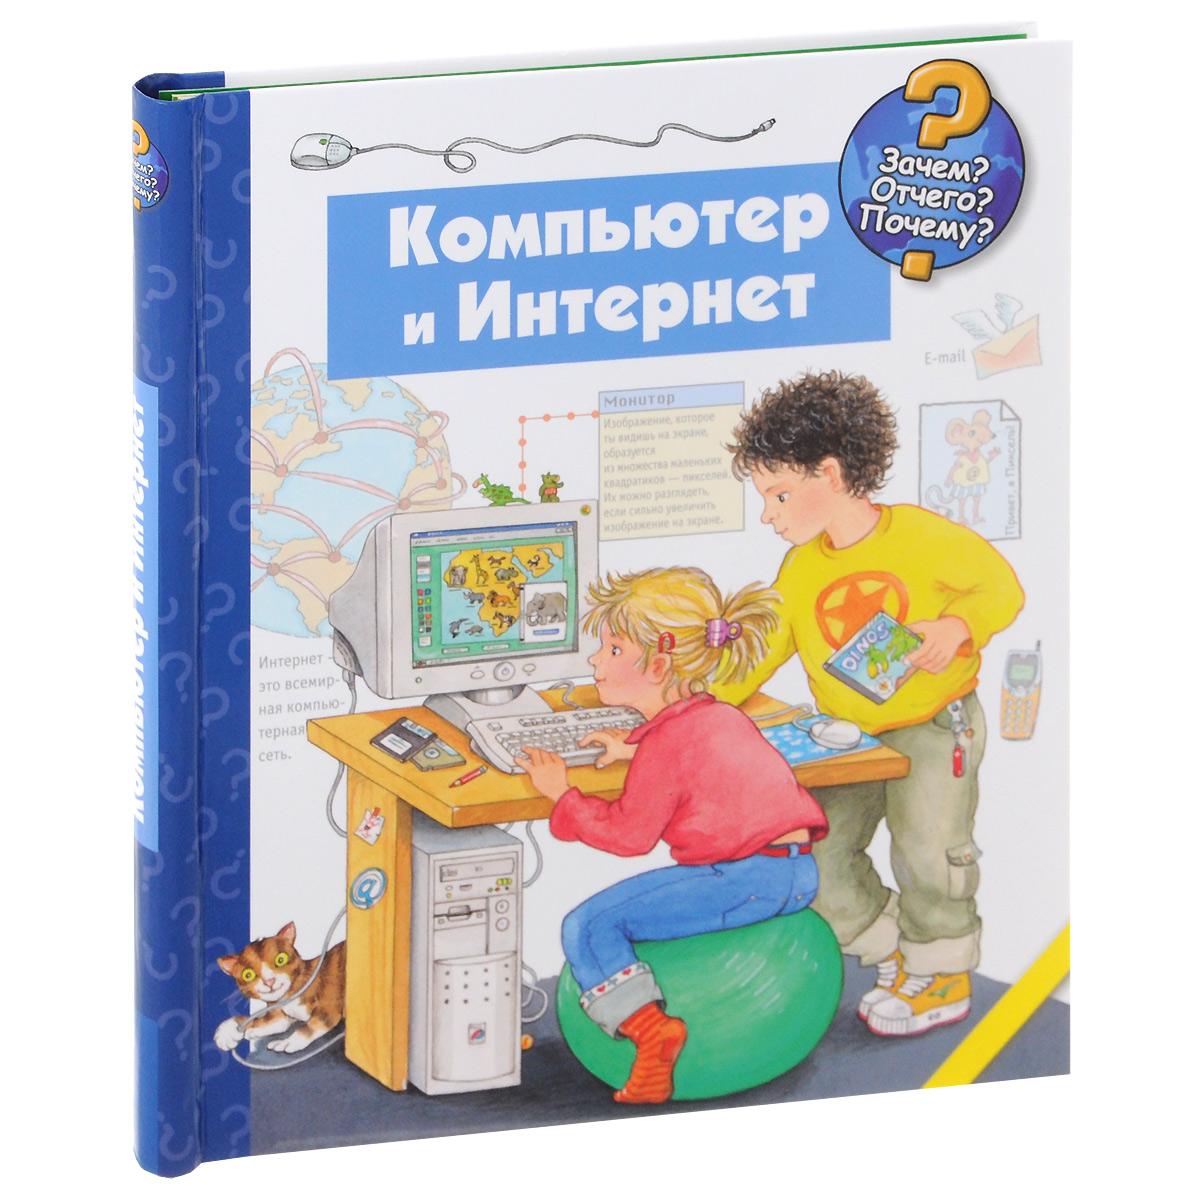 Андреас Вильхельм Компьютер и Интернет компьютер и дети